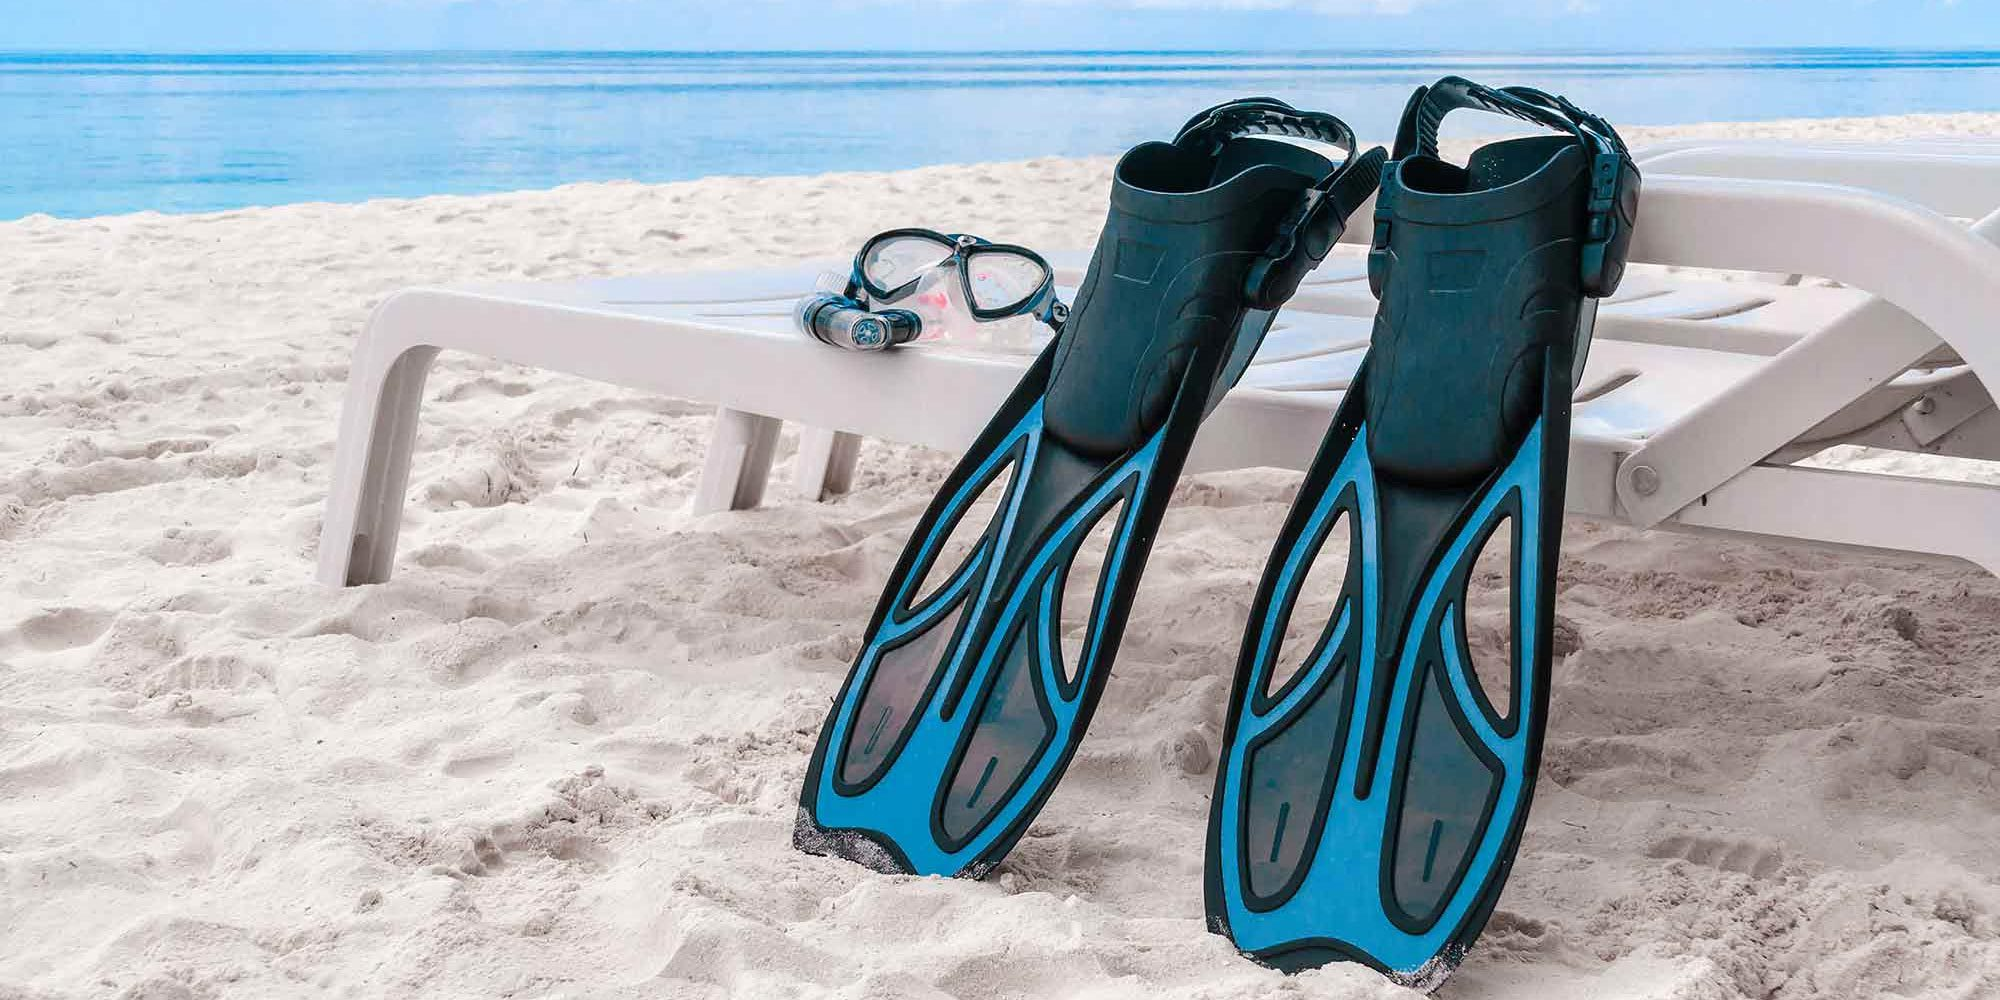 pinne da sub vs snorkeling